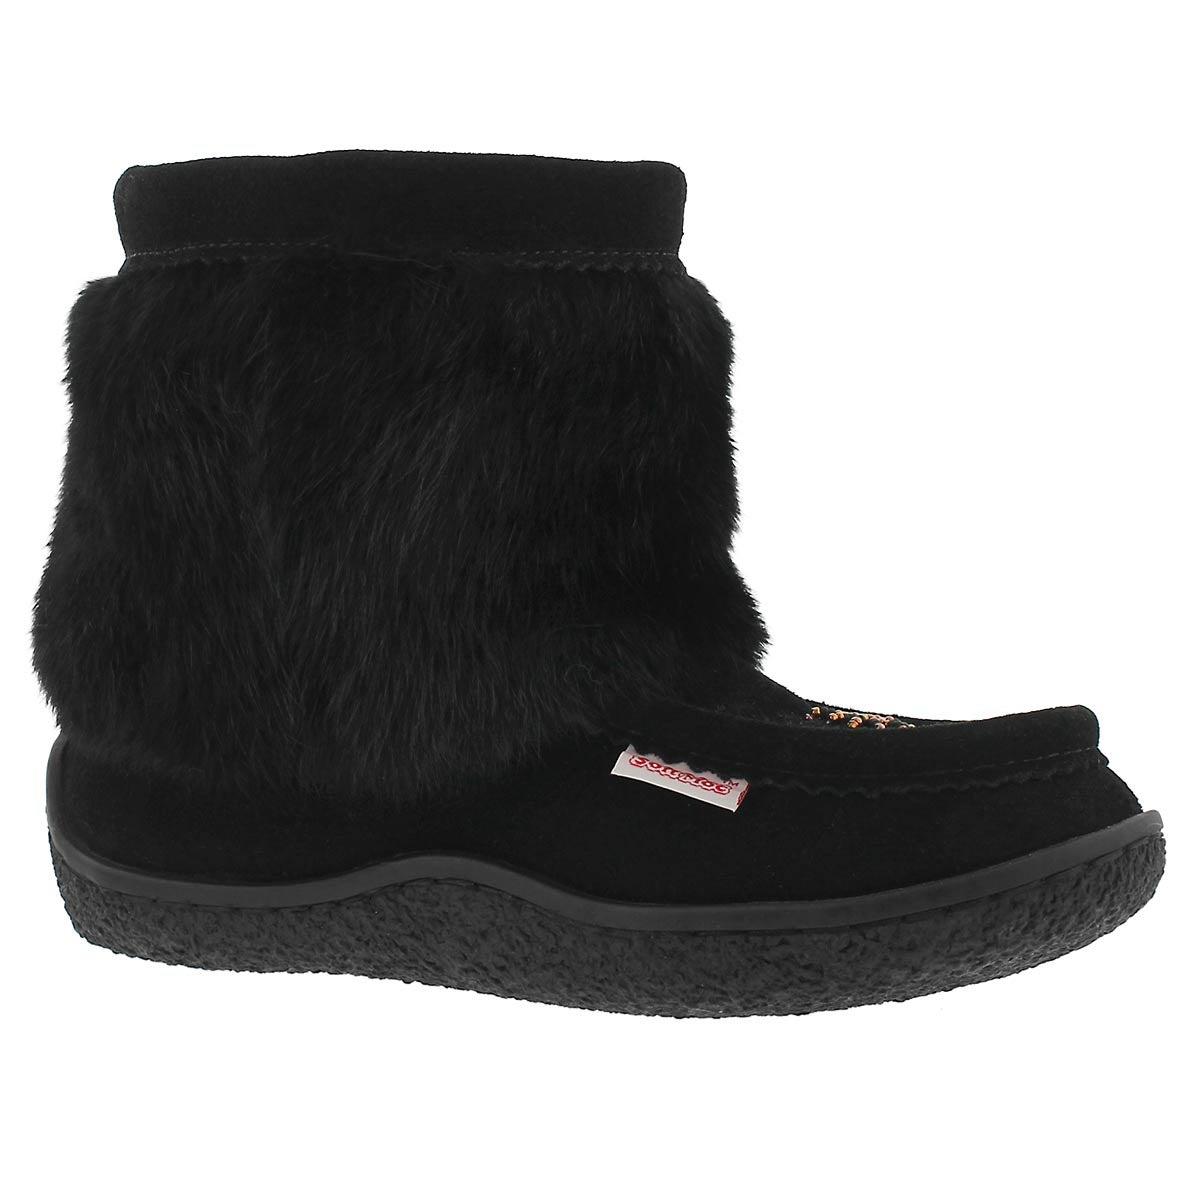 Women's MINIMUK black/black rabbit fur booties